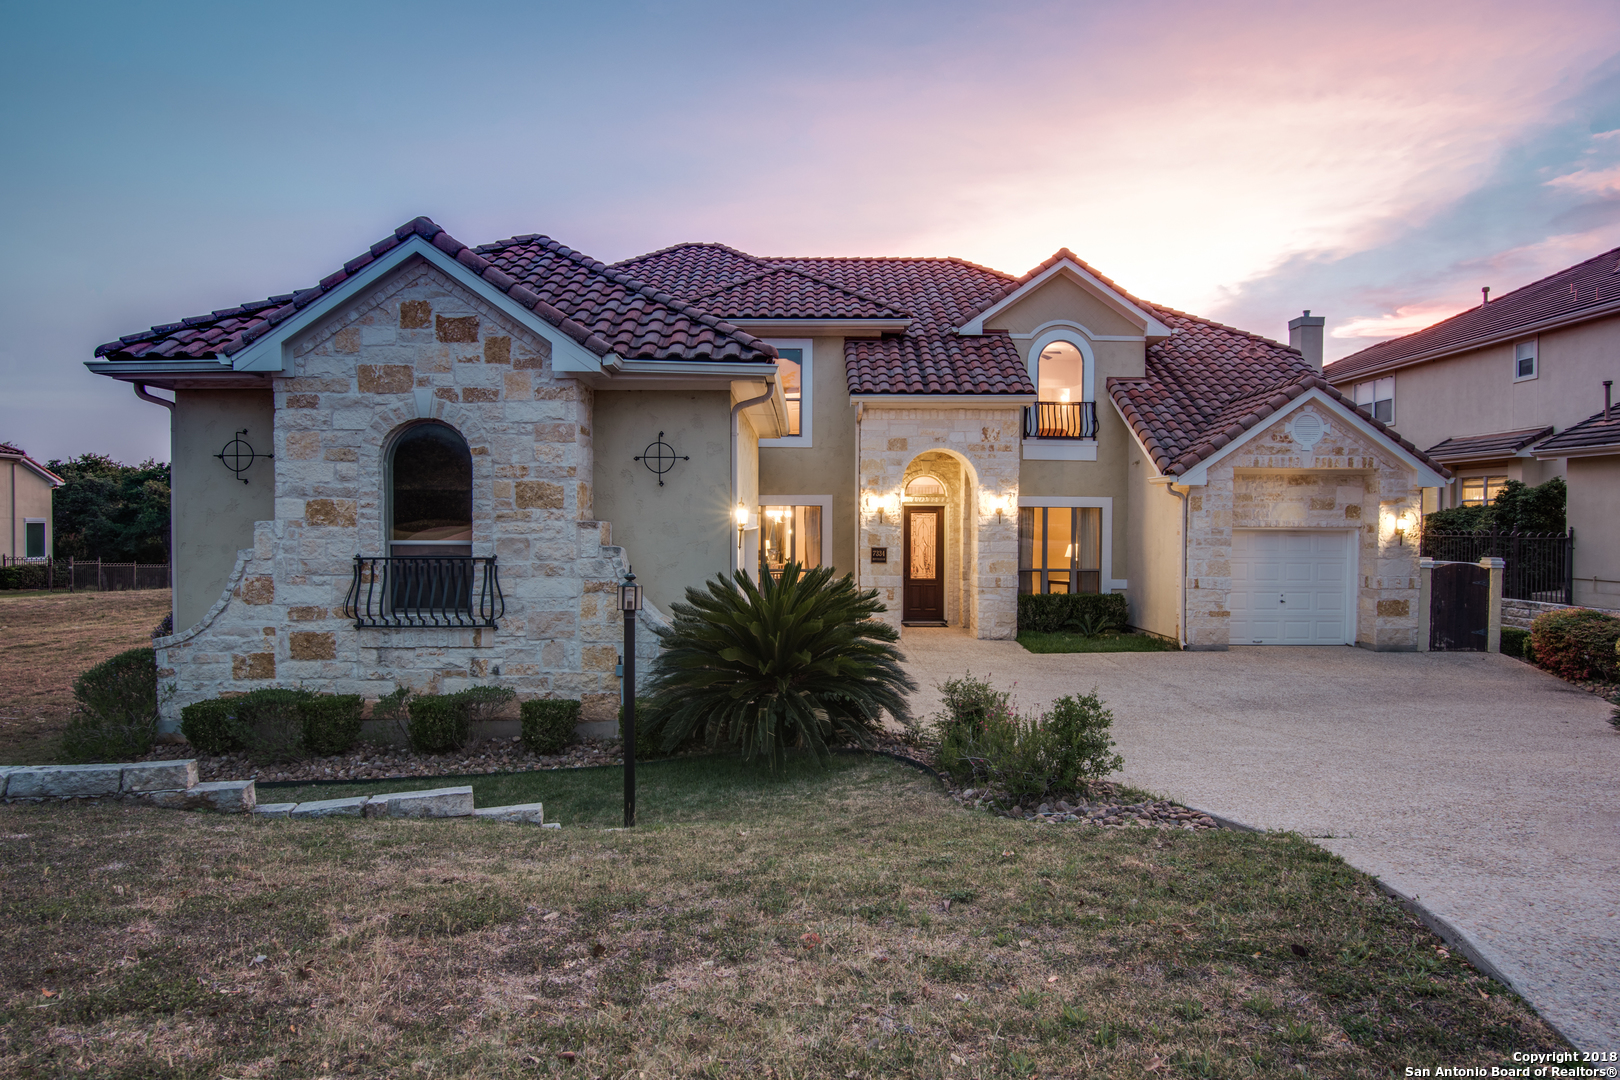 7334 Hovingham San Antonio Tx 78257 1365